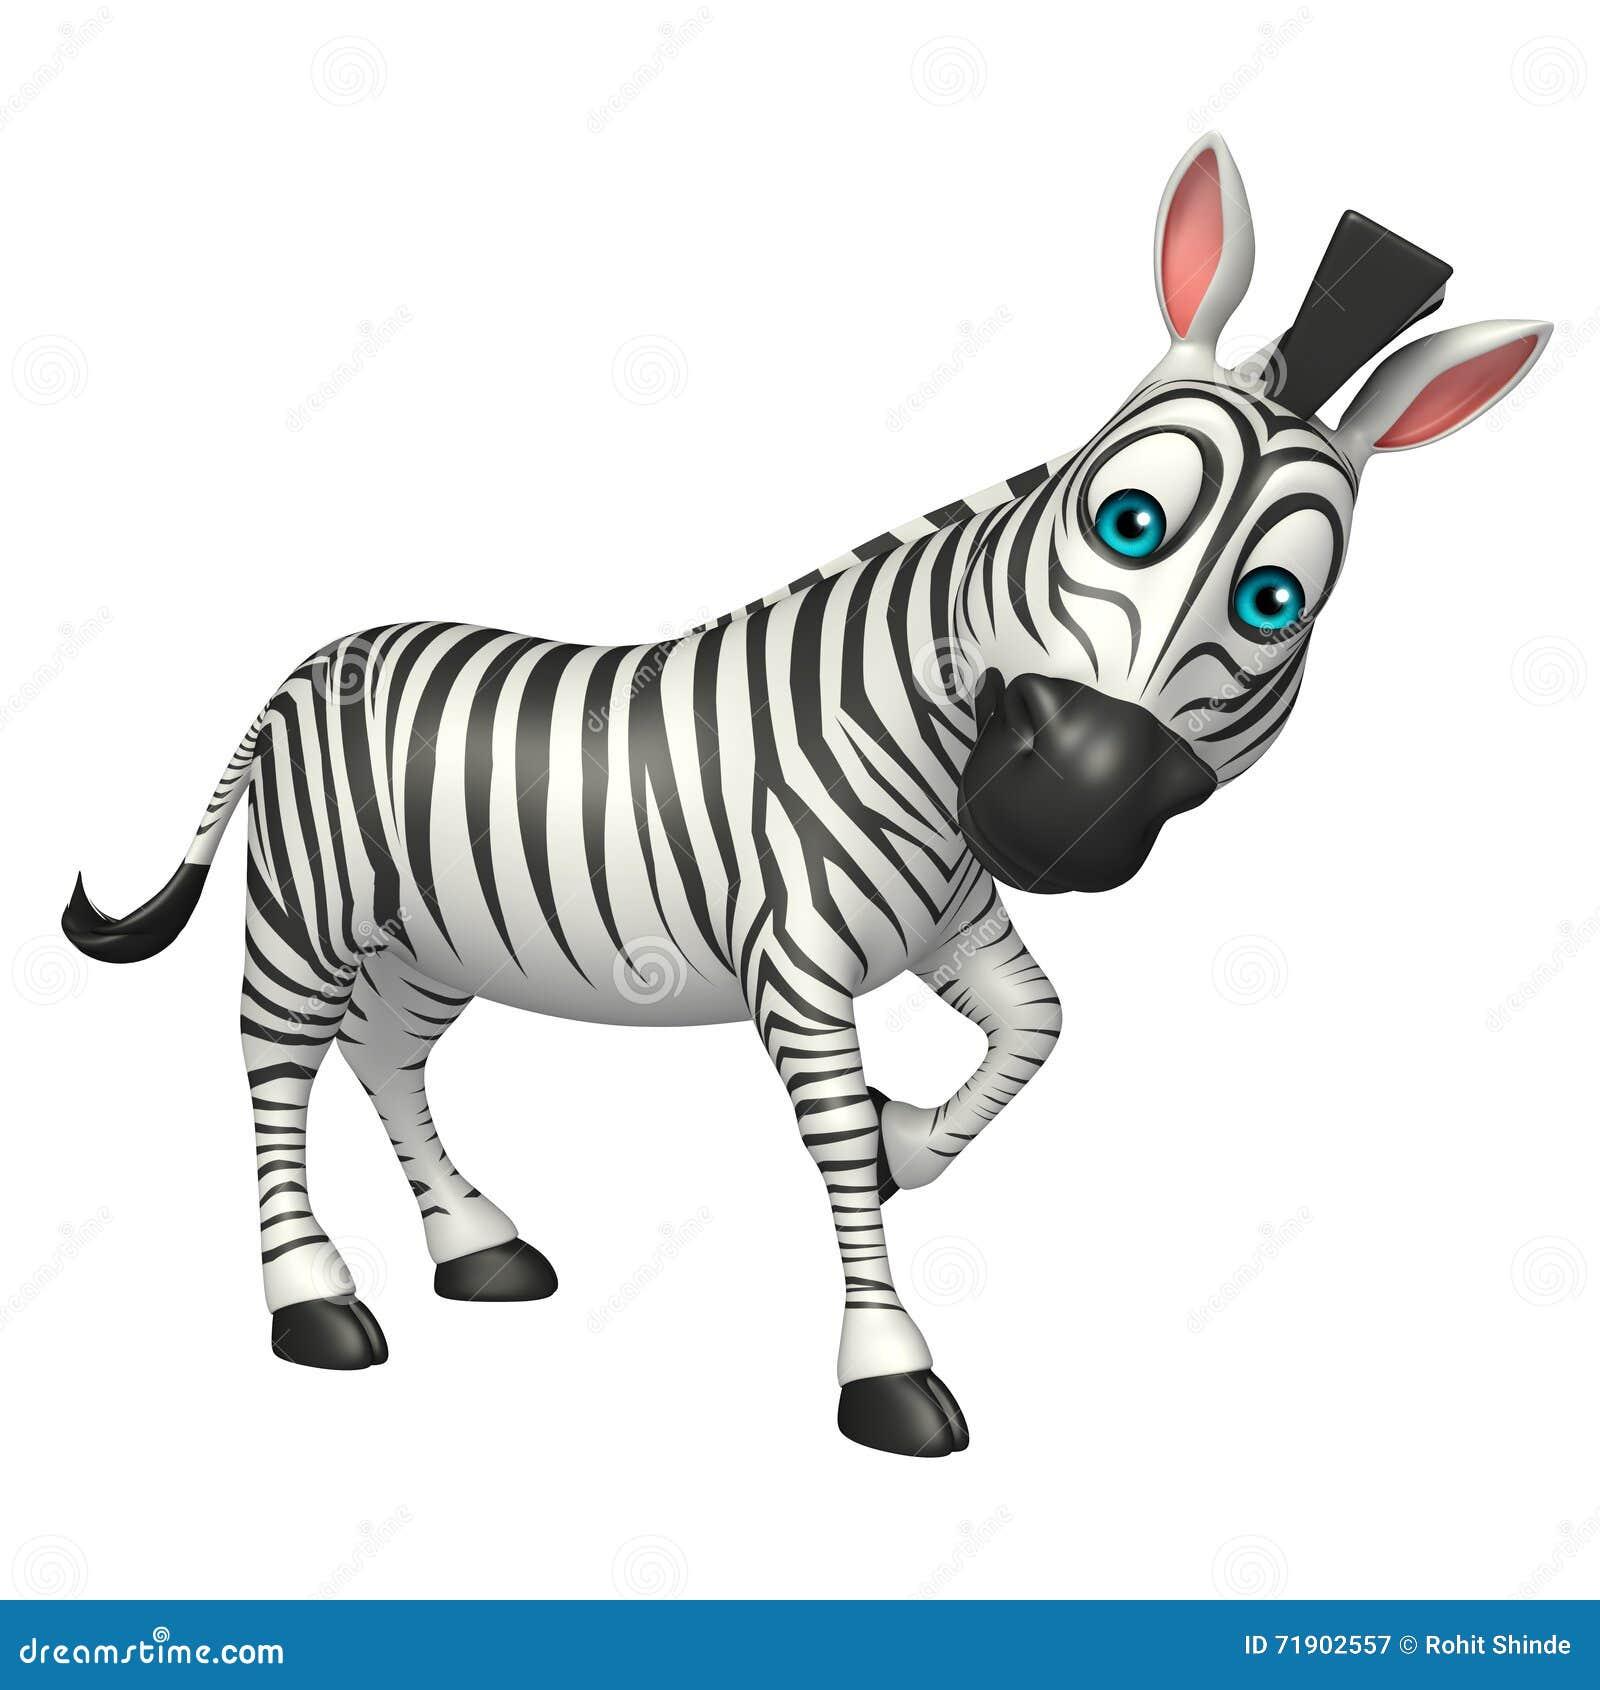 Cartoon Characters Zebra : Funny zebra cartoon character stock illustration image